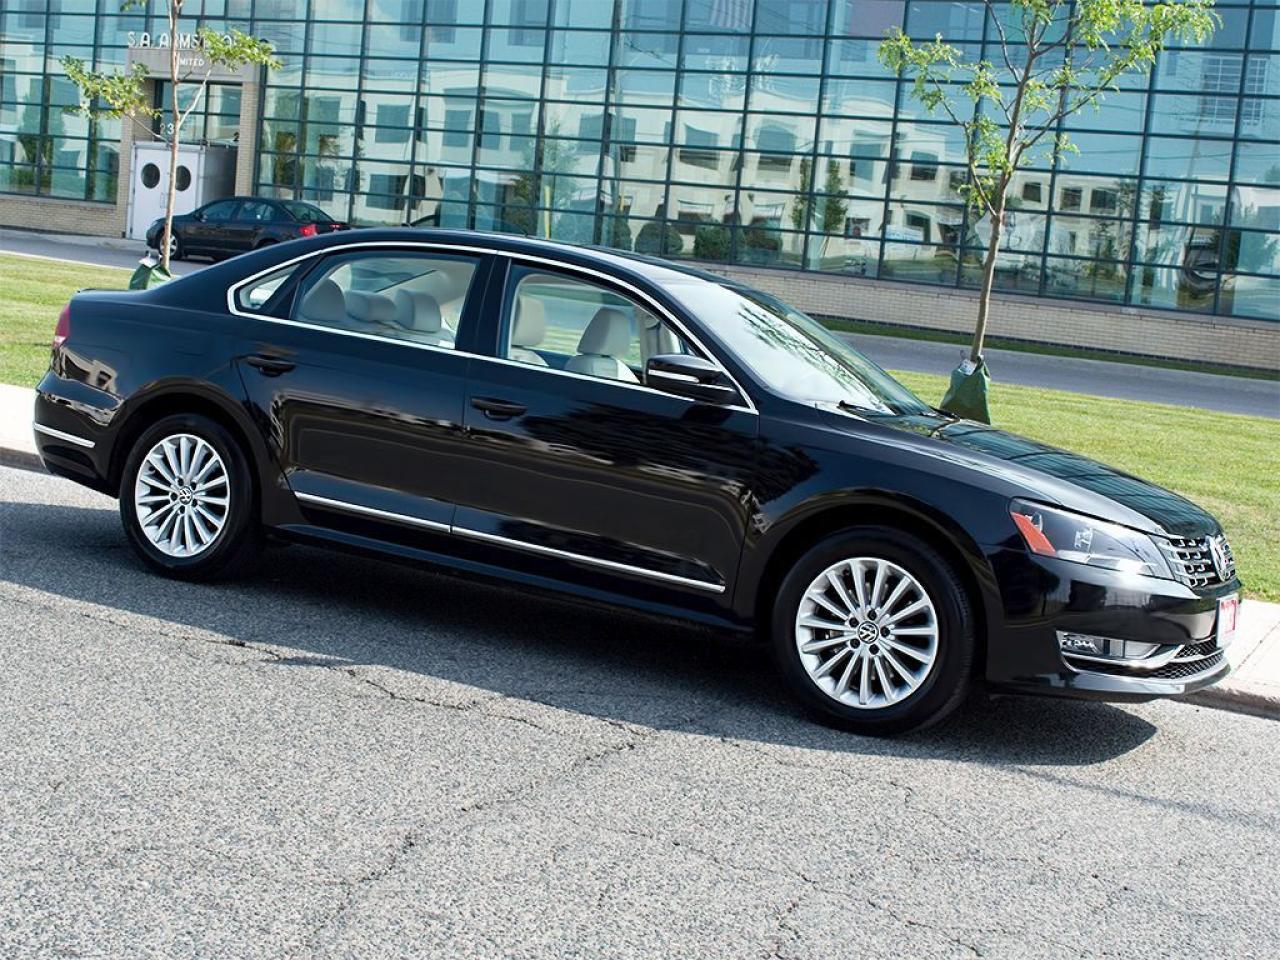 2013 Volkswagen Passat TDI|NAVI|REARCAM|SUNROOF|LEATHER